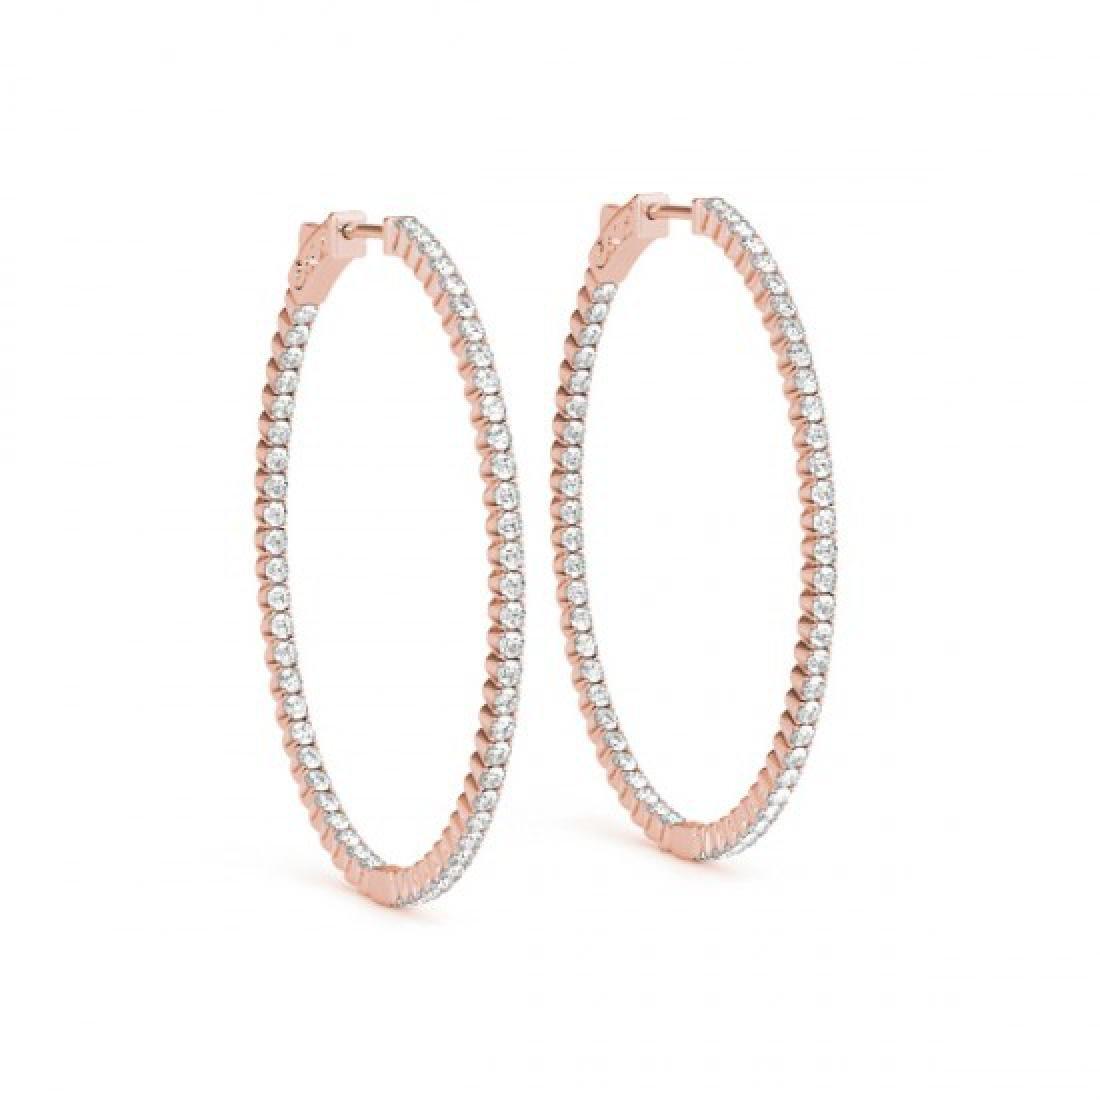 3 CTW Diamond VS/SI Certified 36 Mm Hoop Earrings 14K - 2